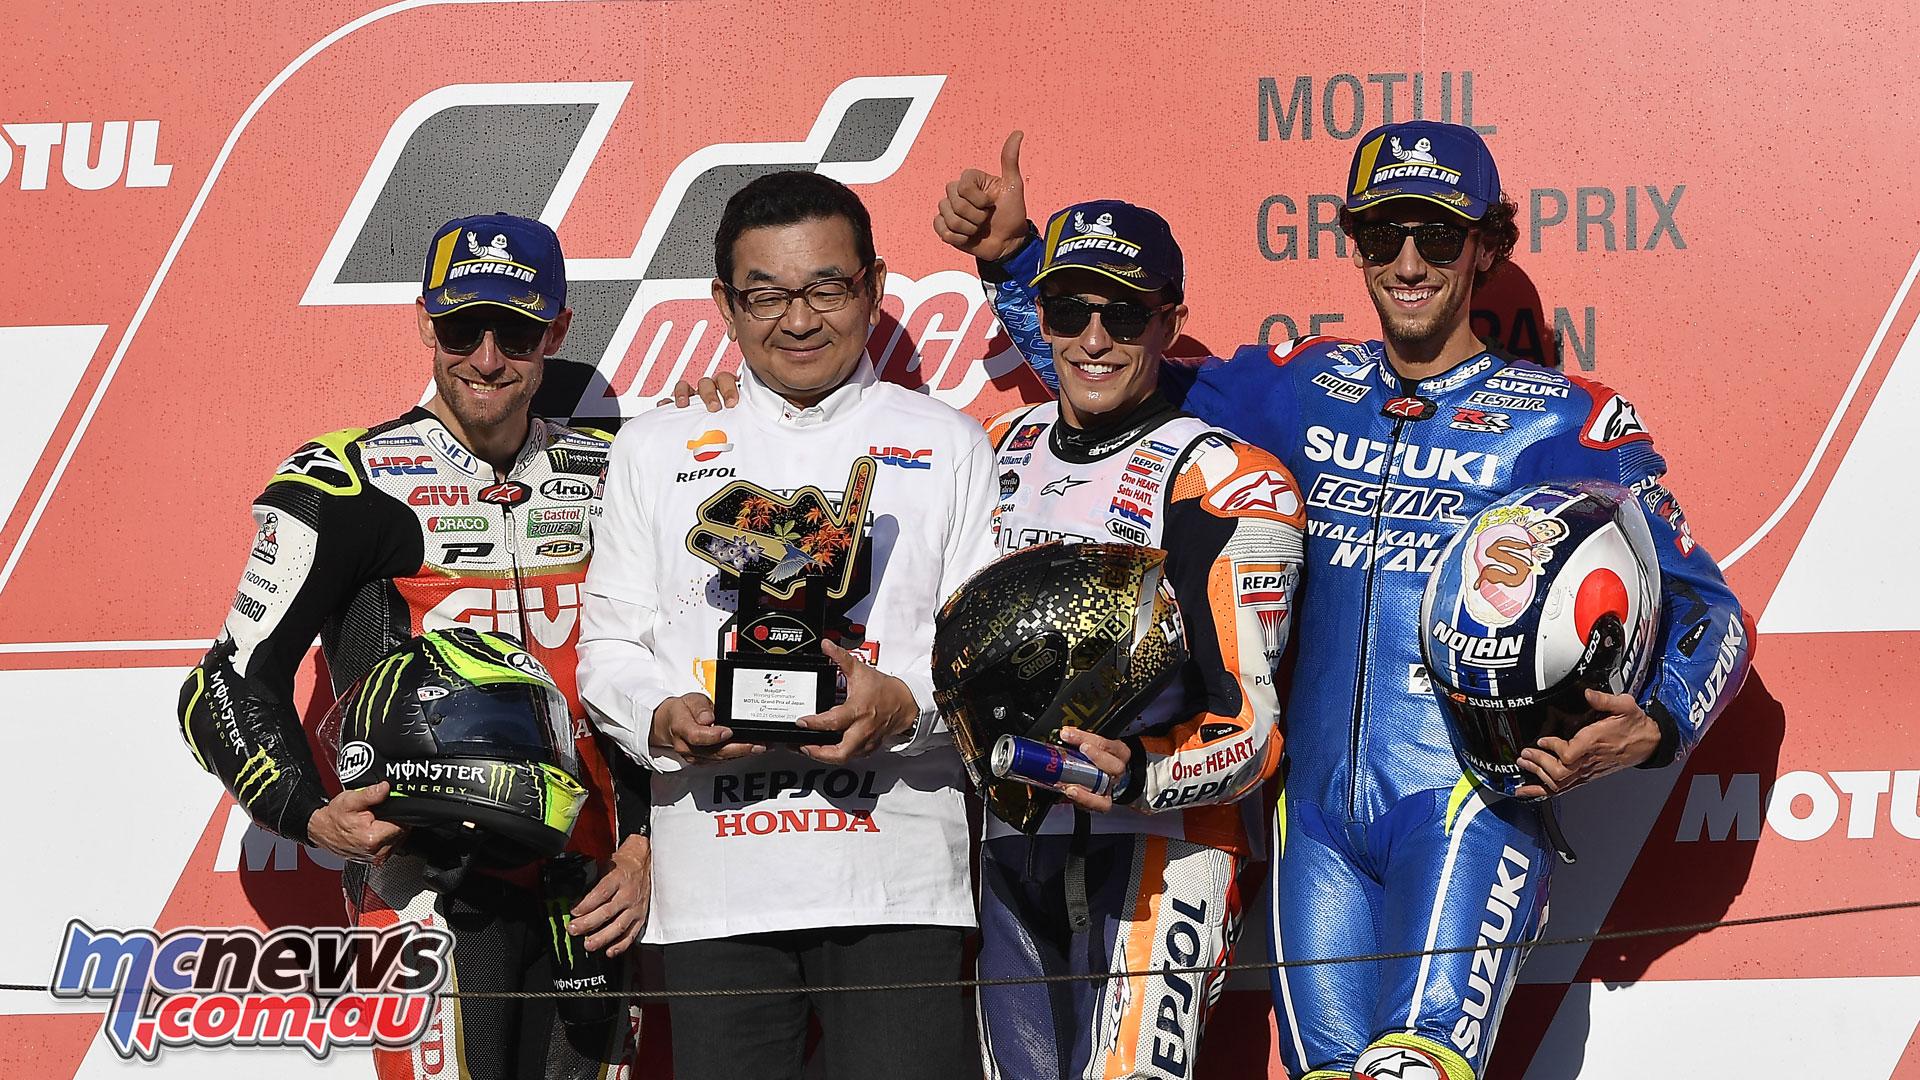 MotoGP 2018 Motegi